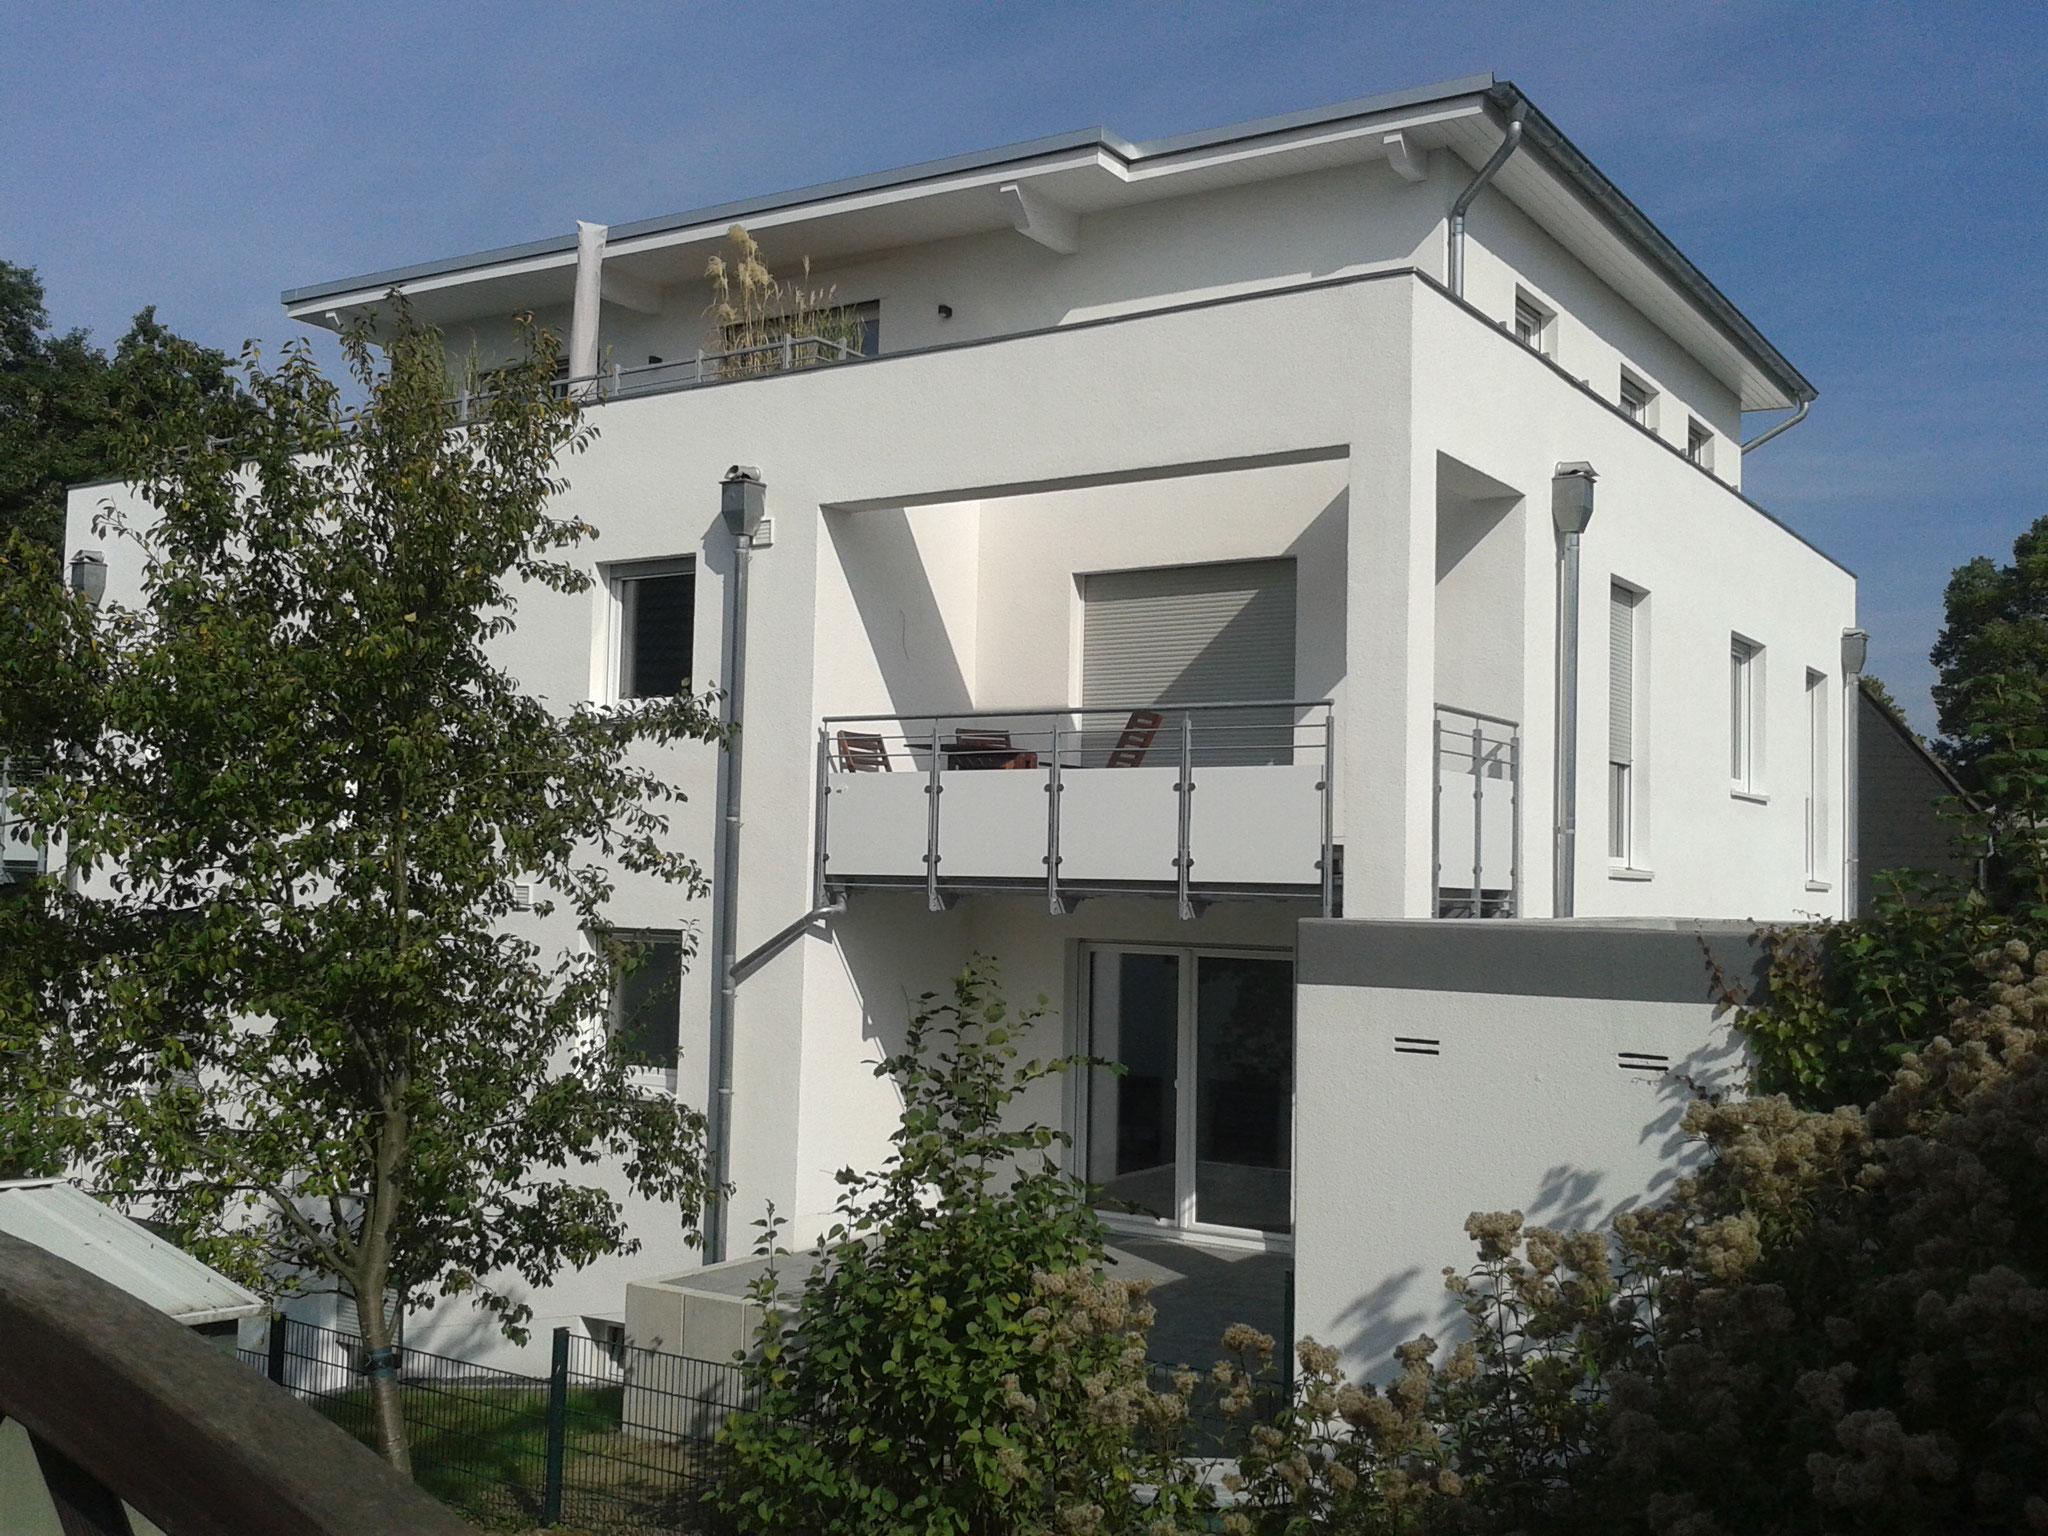 2016: Dortmund-Höchsten, Wittbräucker Straße 435